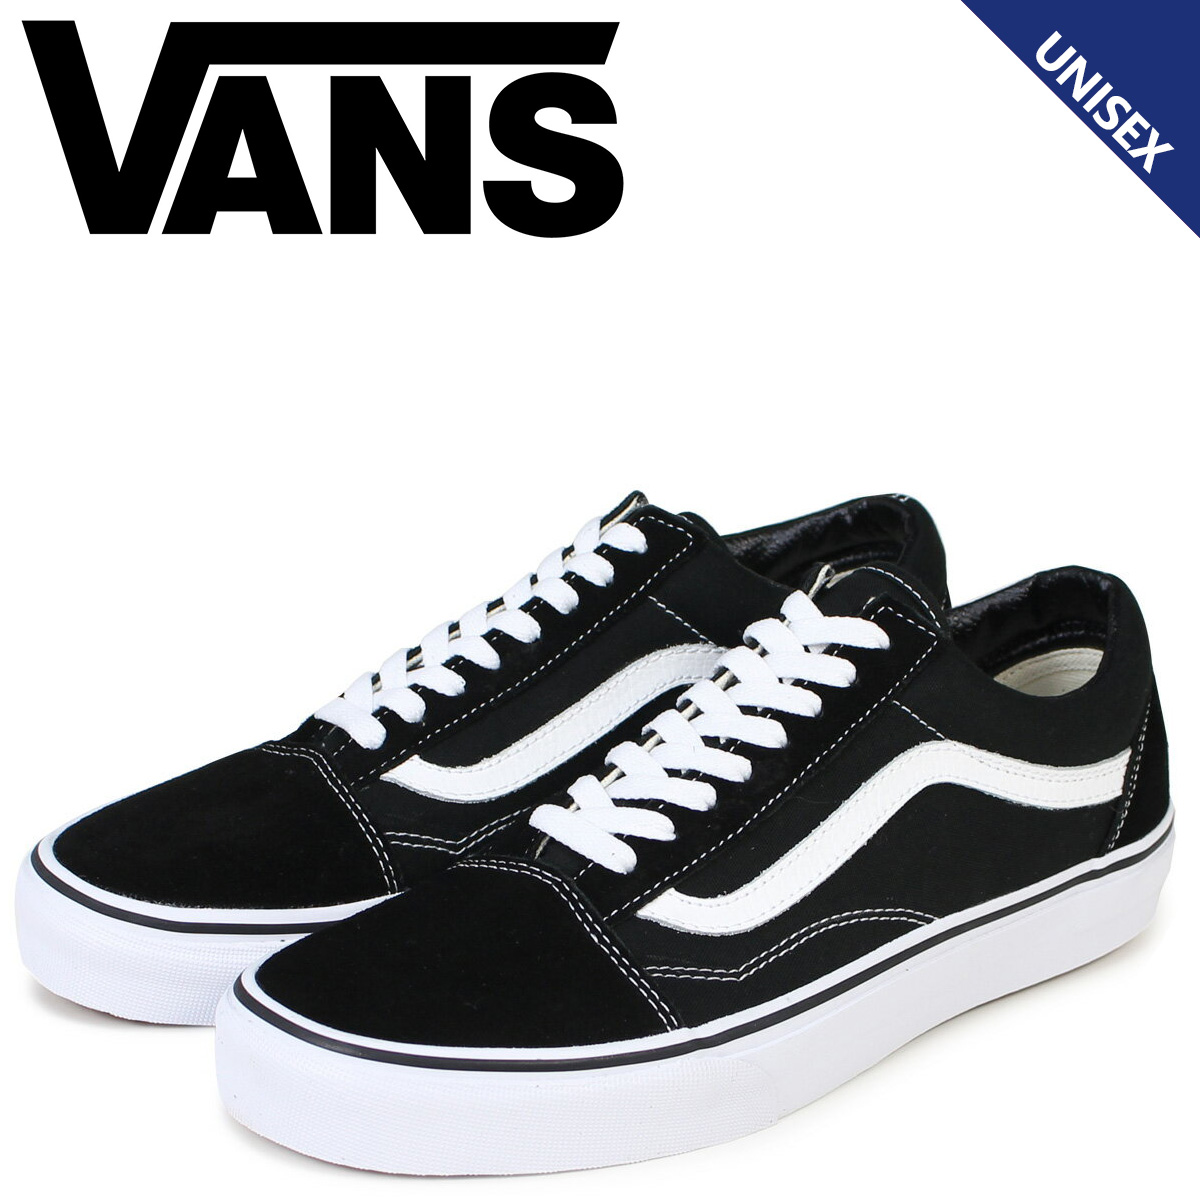 cfe64f0574 VANS old school sneaker mens vans vans OLD SKOOL shoes black  book product  11   26 days in stock will add in stock